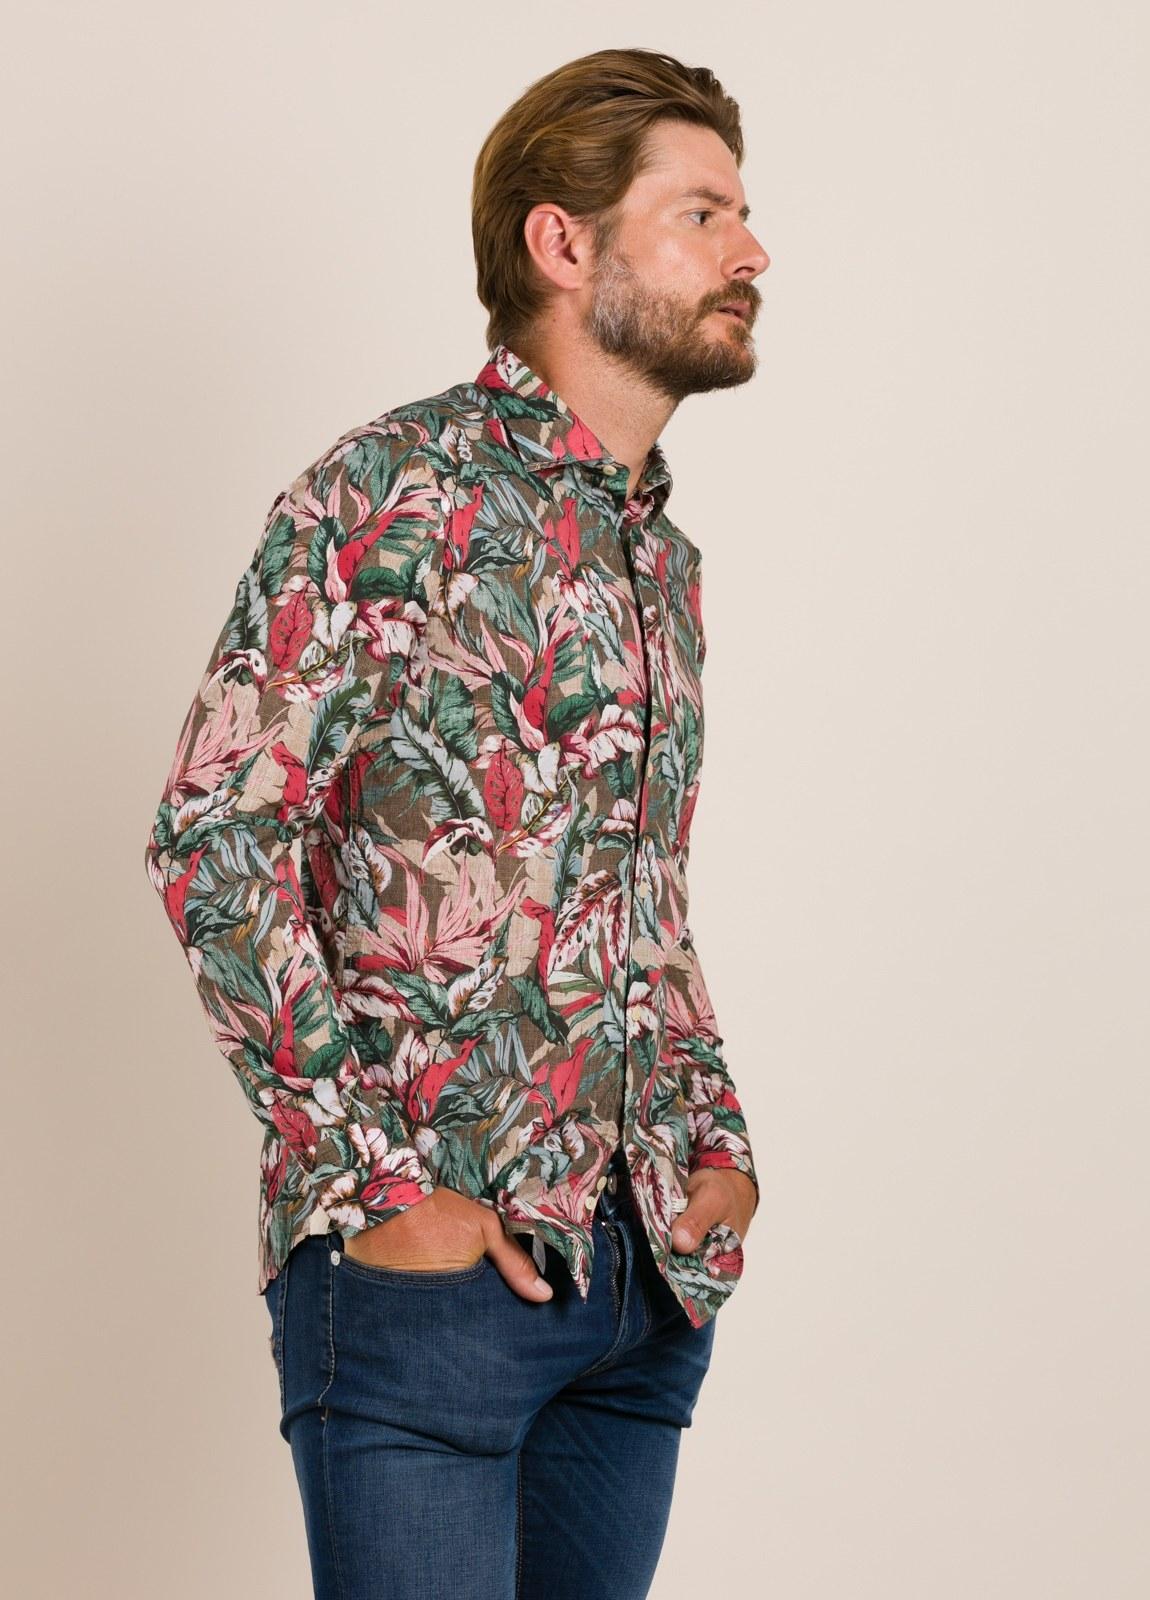 Camisa sport TINTORIA MATEI estampado tropical - Ítem1